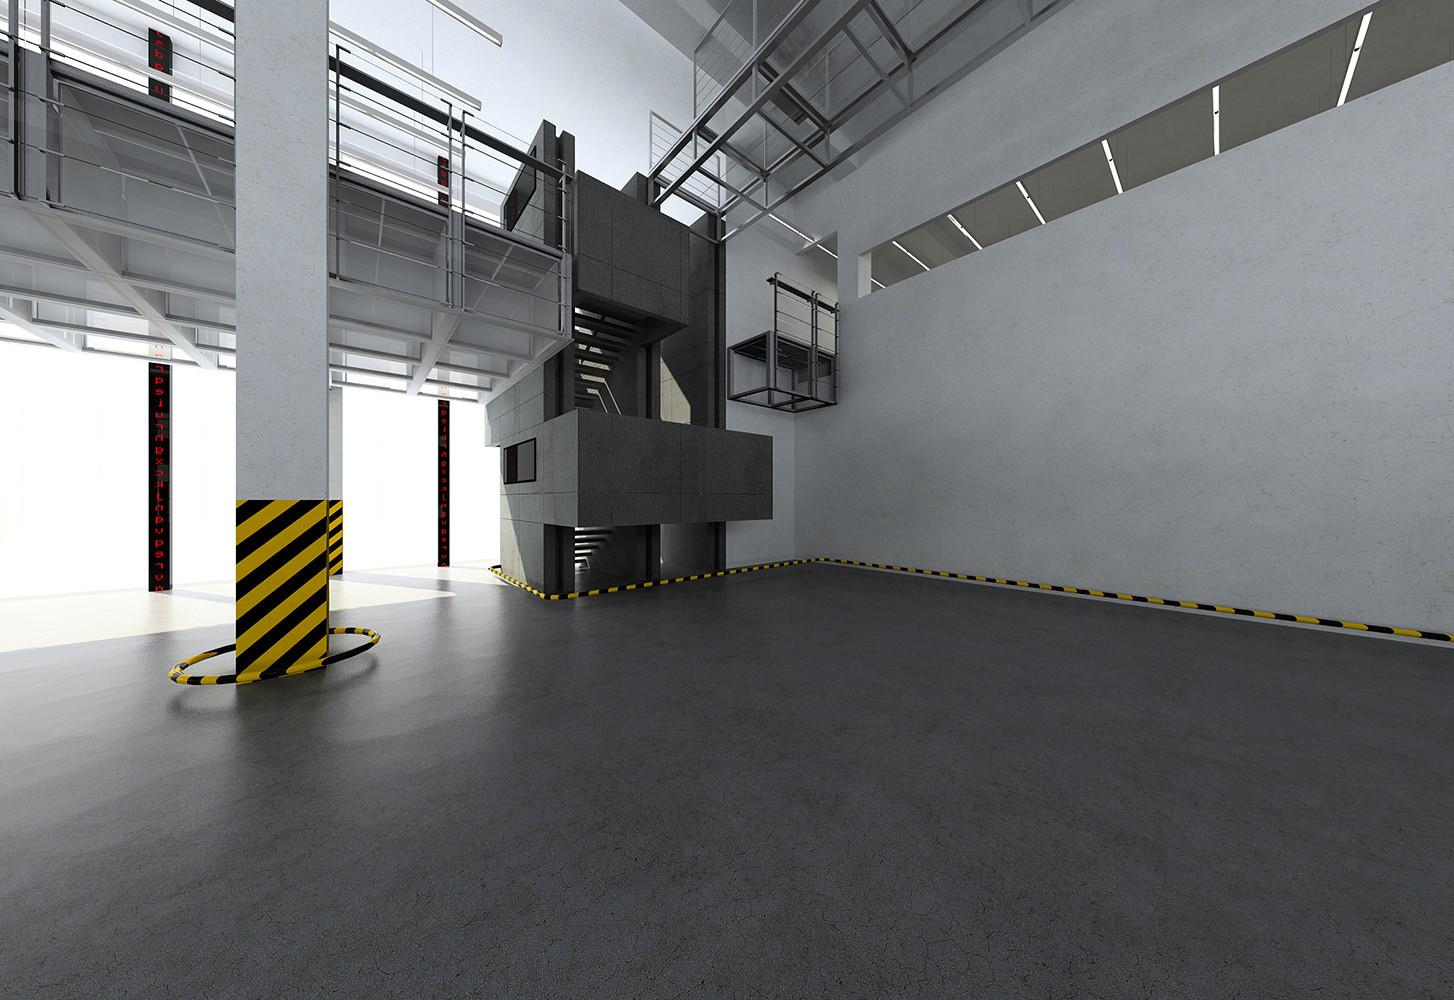 test_03_0000006.jpg